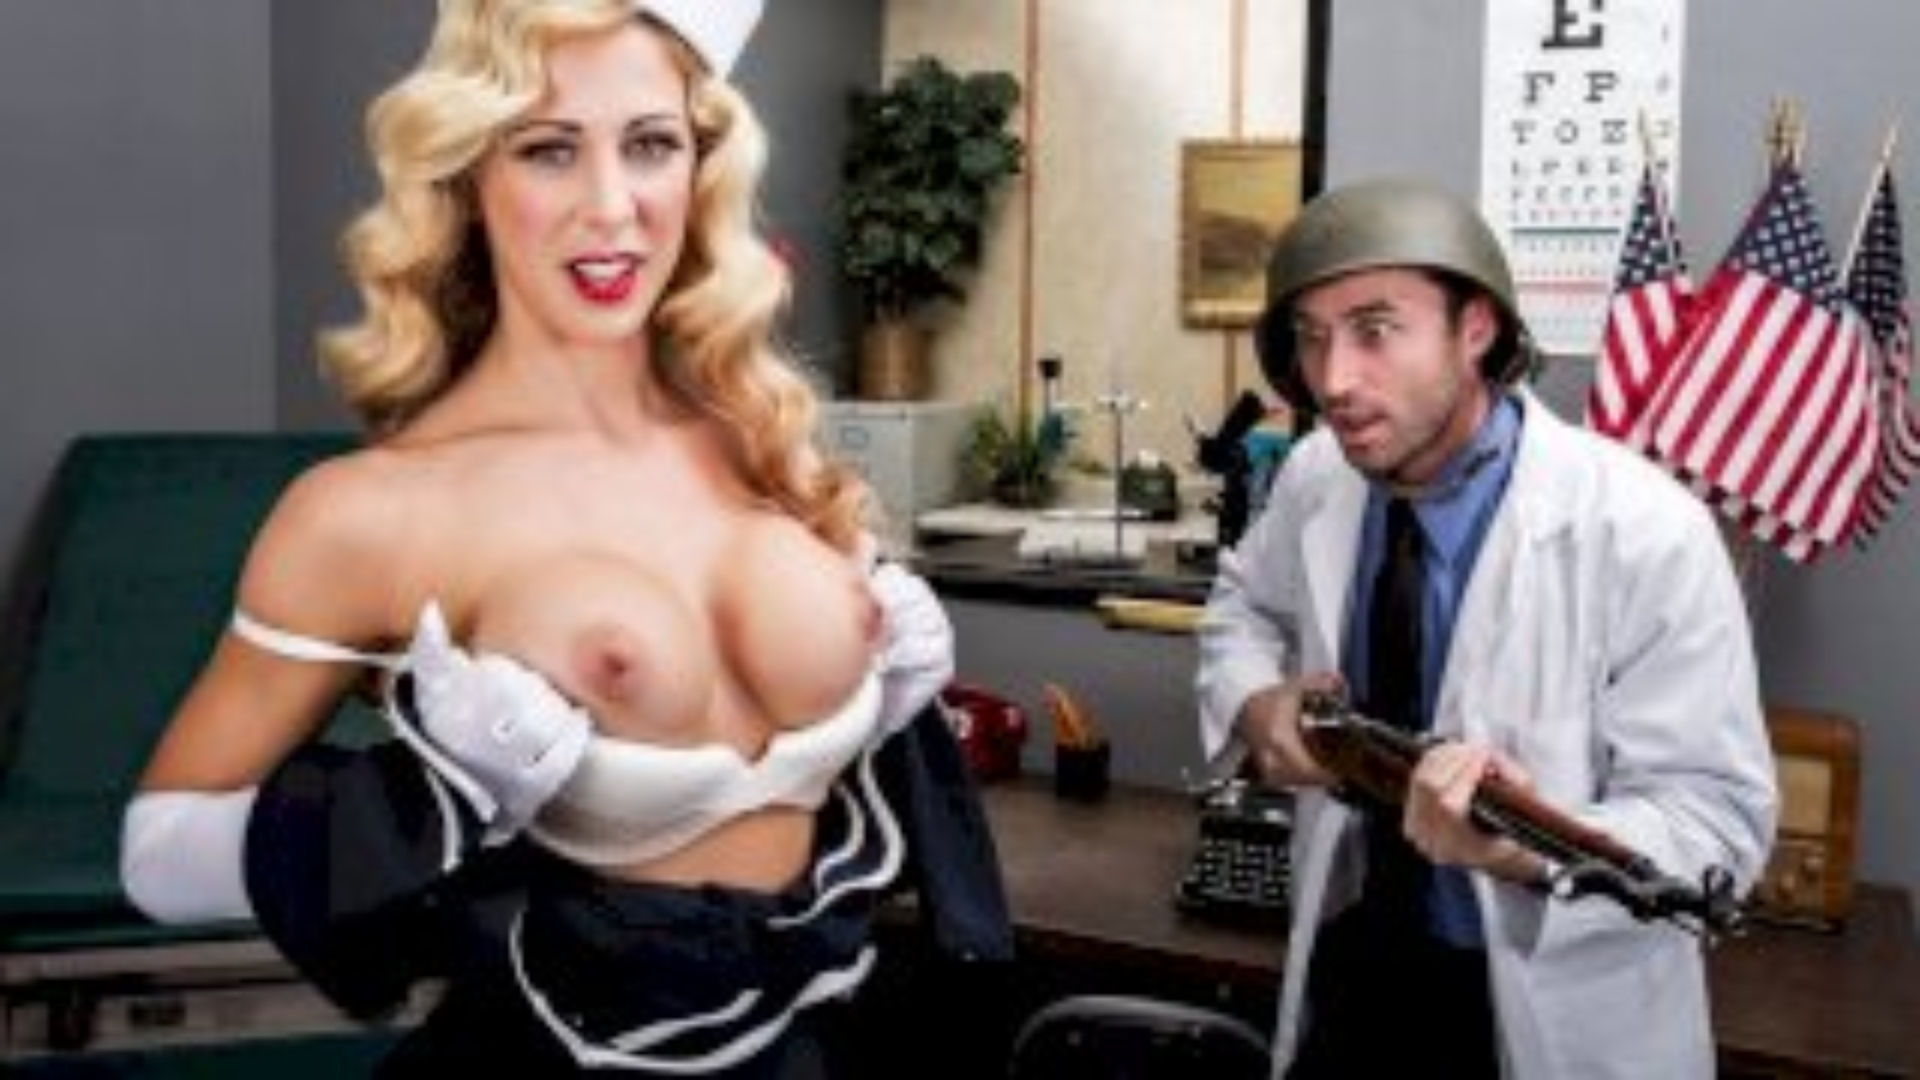 America's Secret Sweetheart - Big Tits In Uniform